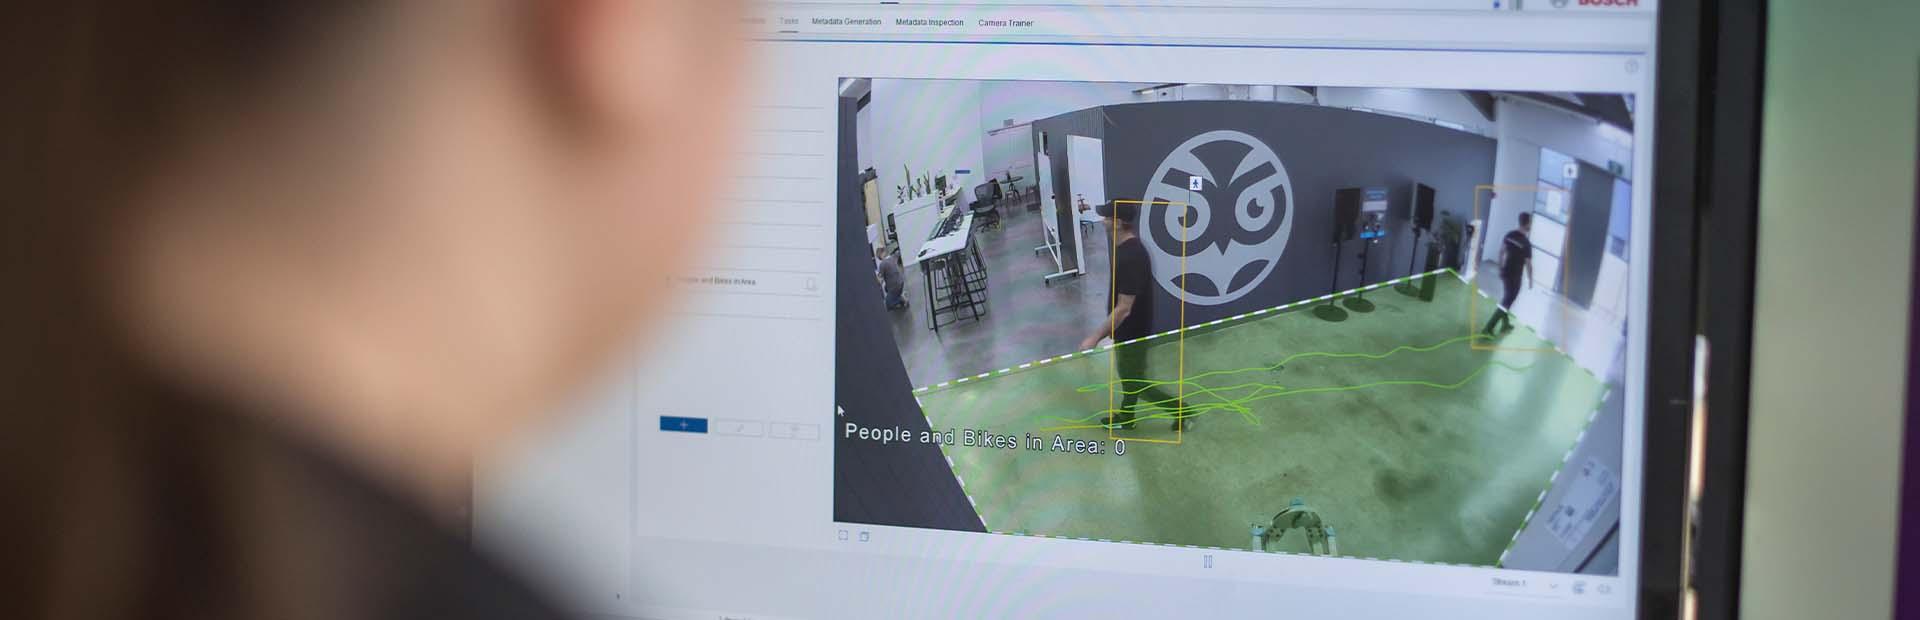 Camera Analytics software